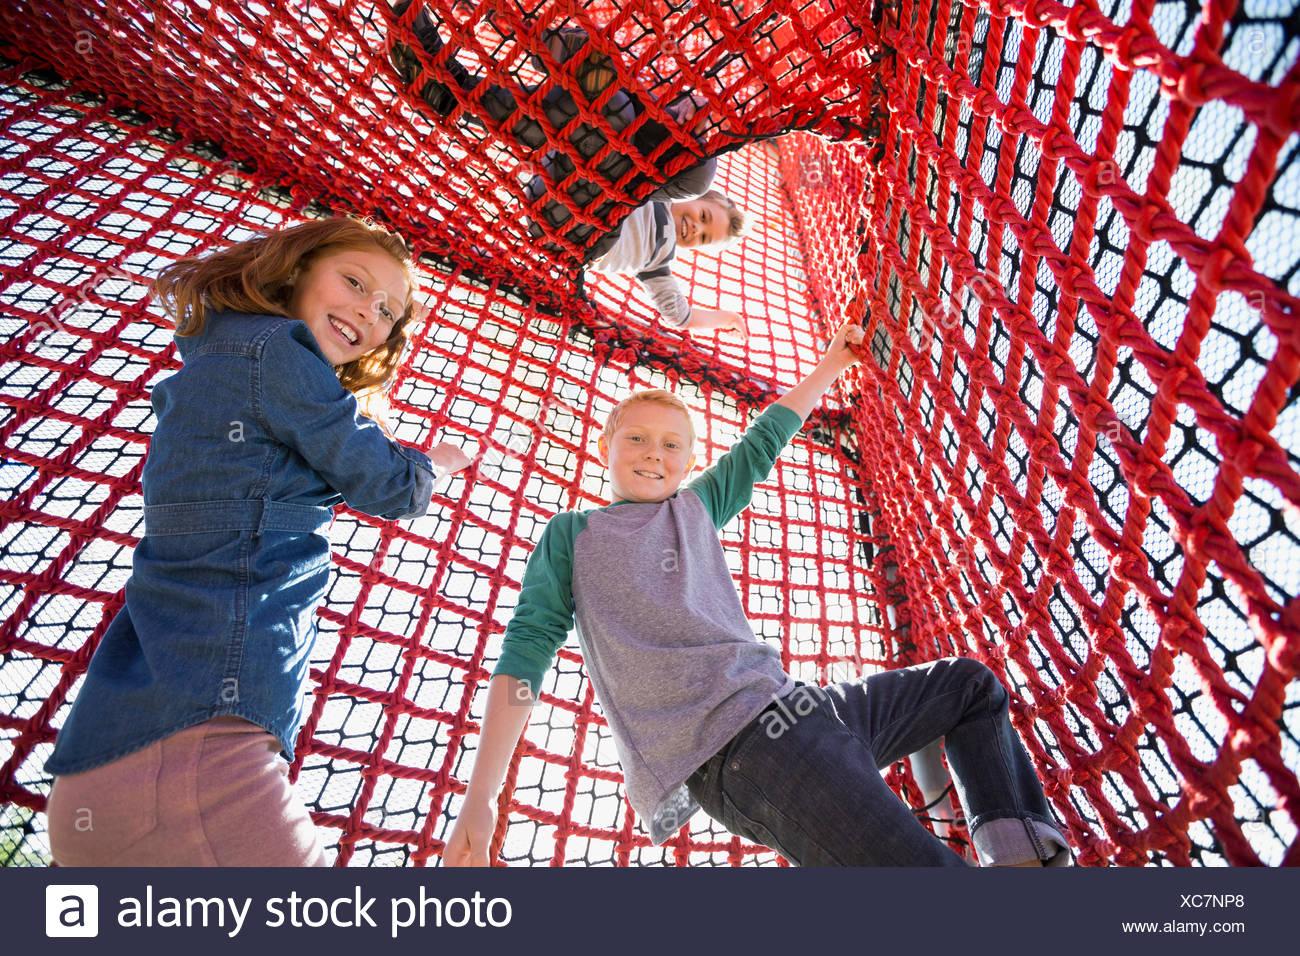 Portrait kids climbing rope net at playground - Stock Image